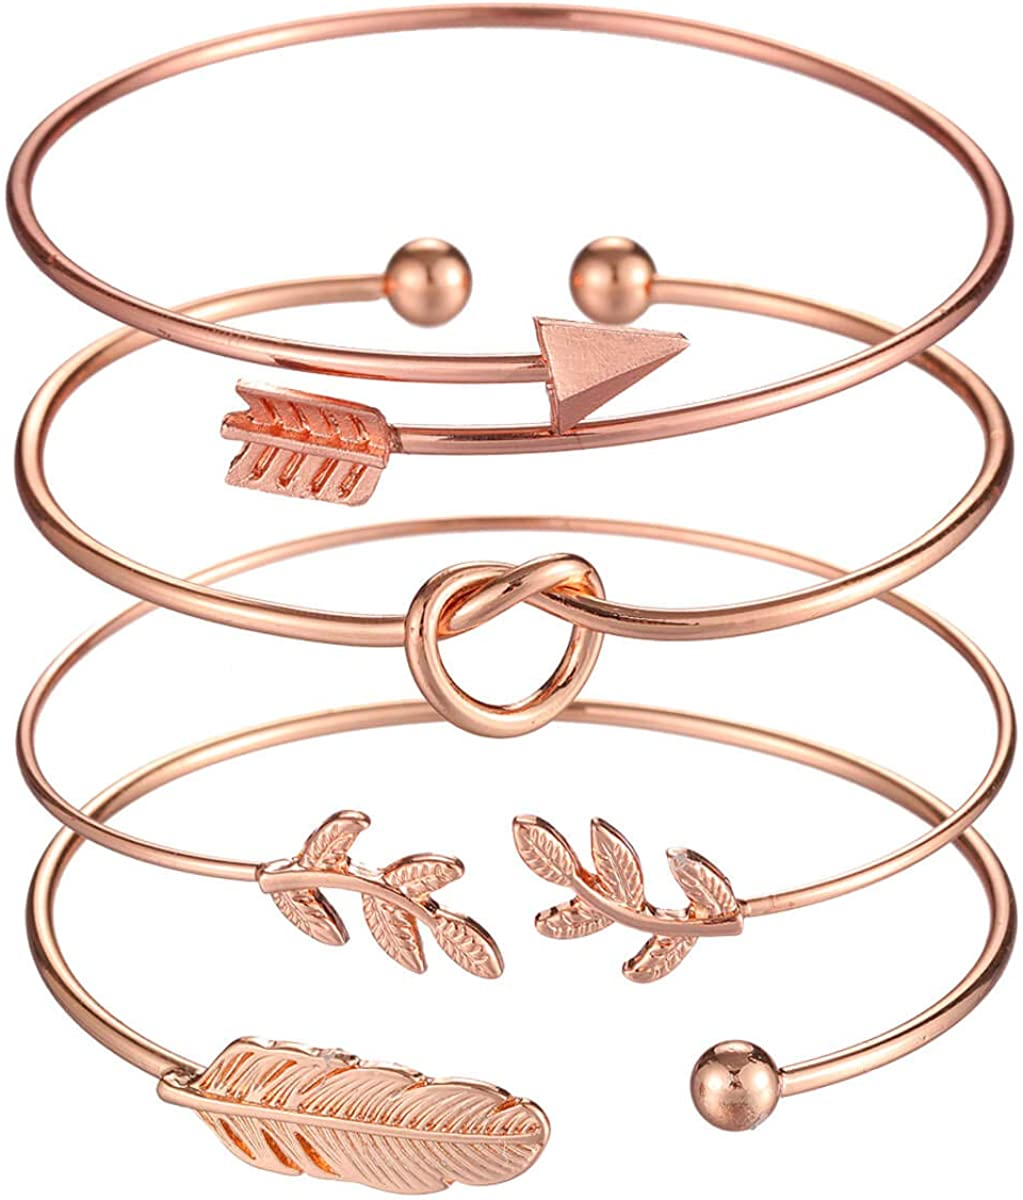 Starain 4Pcs Rose Gold Bracelets for Women Girl Simple Leaf Arrow Feather Knot Heart Bangle Bracelet Adjustable Cuff Bracelet Set